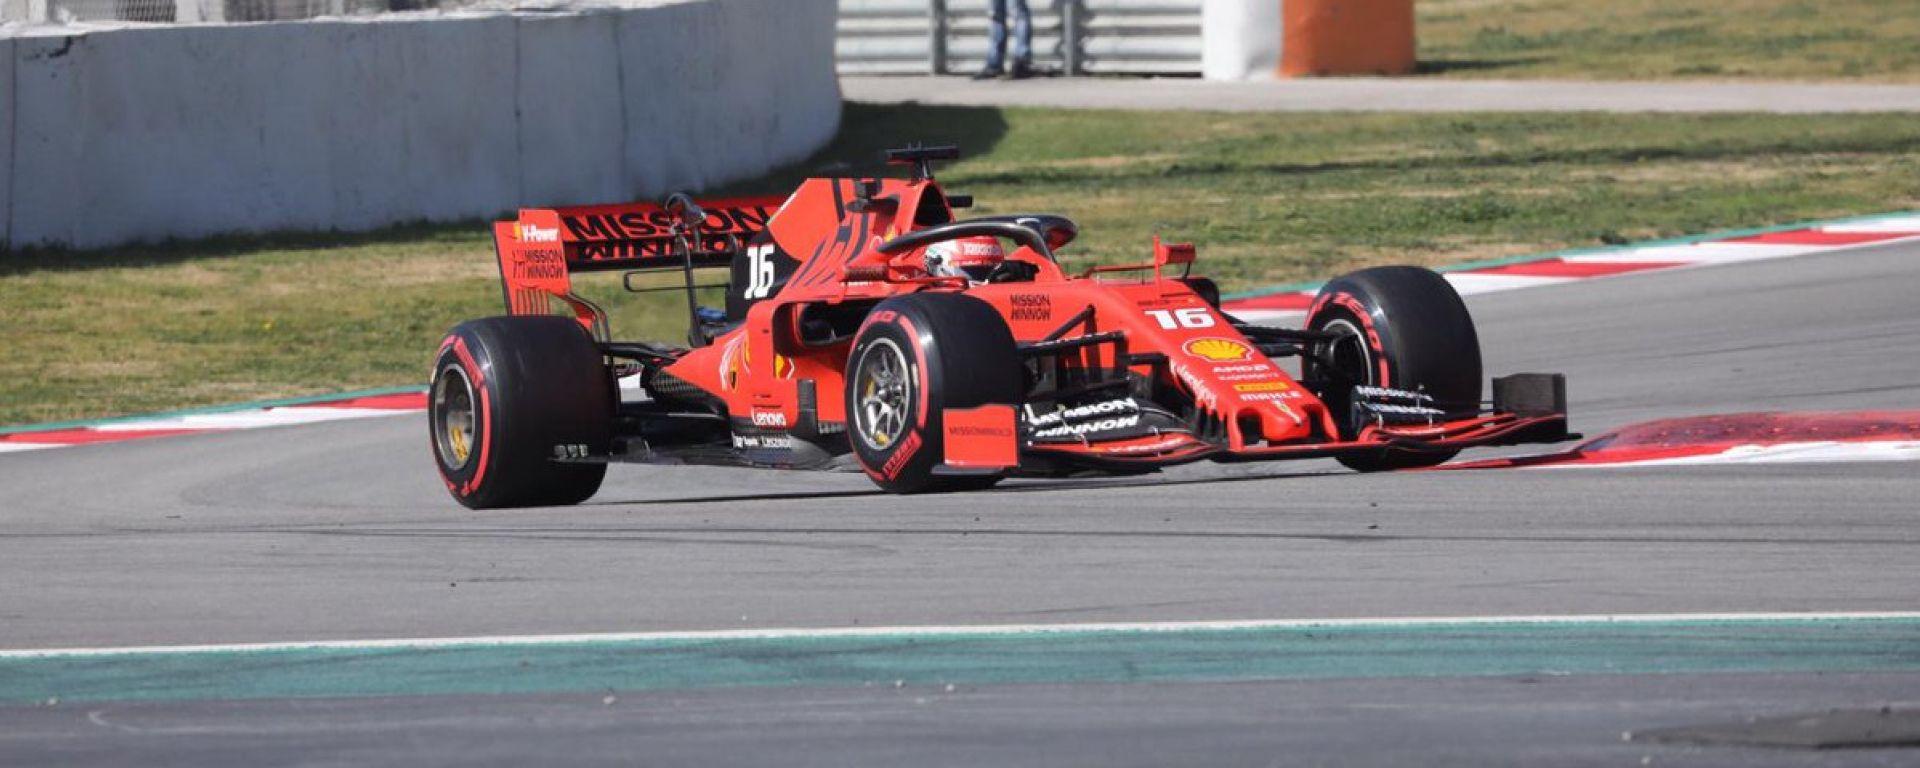 Test F1 Barcellona-2, day 3: Charles Leclerc (Ferrari)